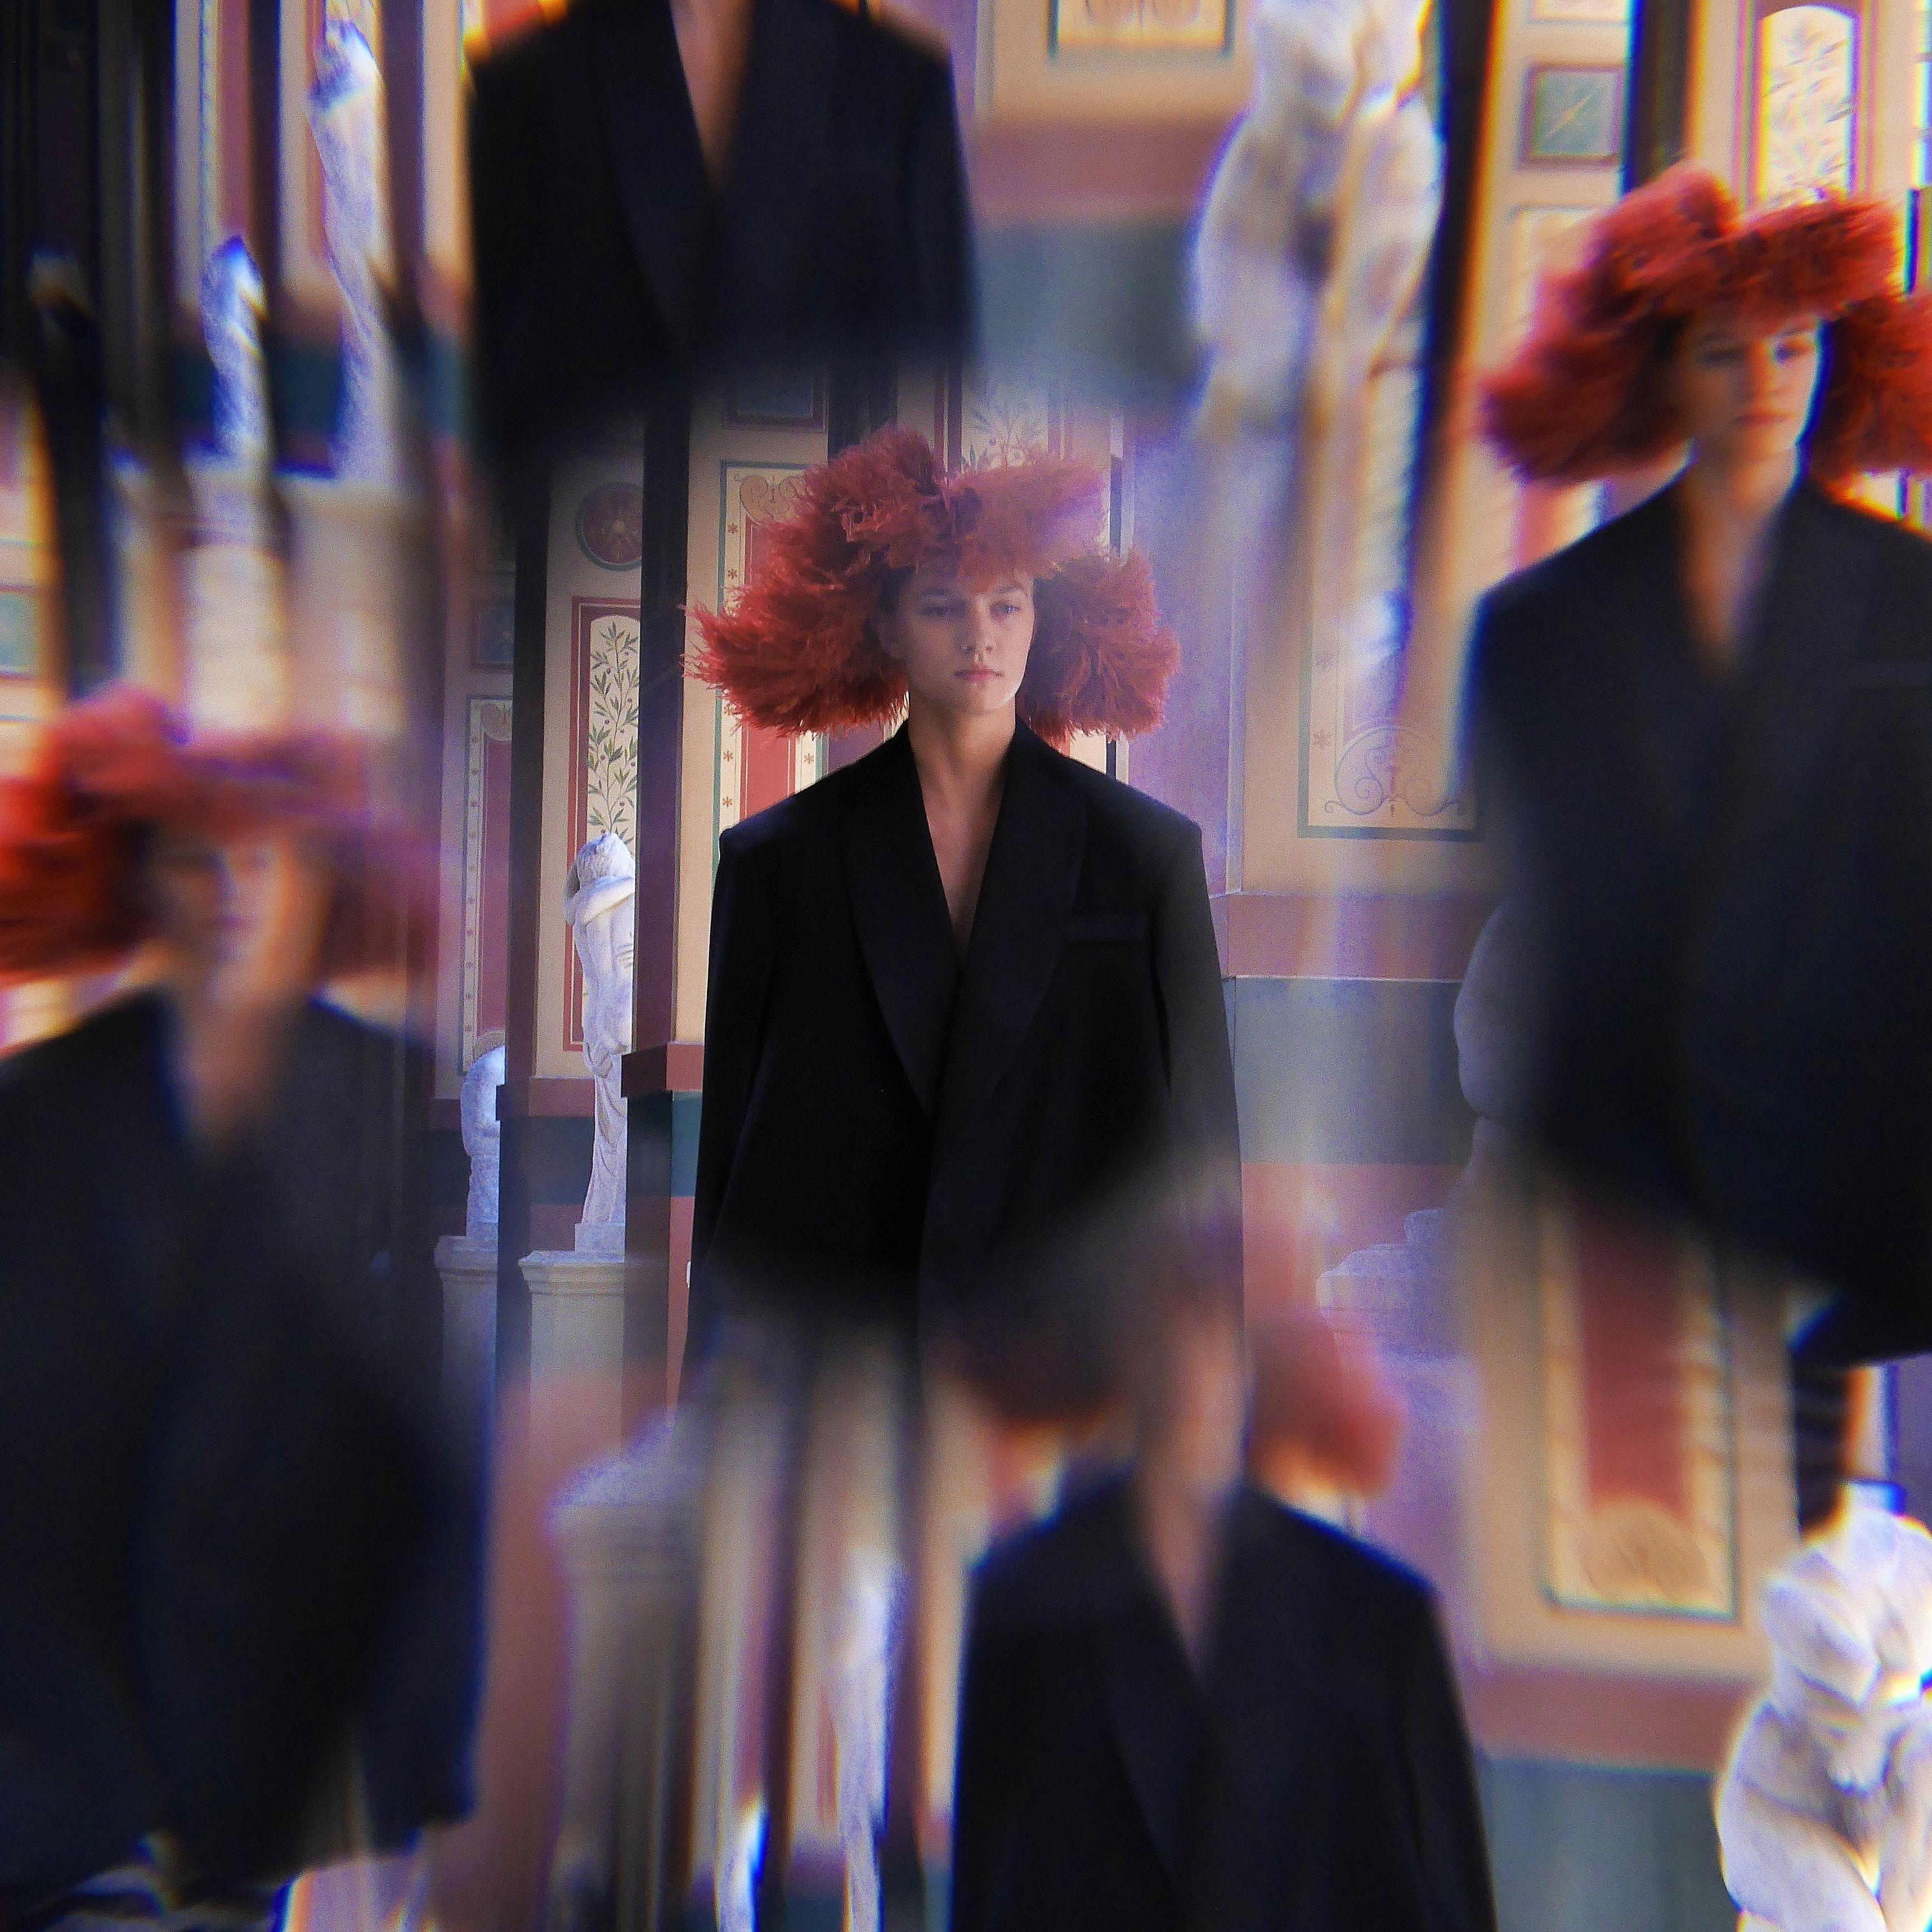 Frank_Perrin_Rykiel_Atelier_2018_1560380-Exposure